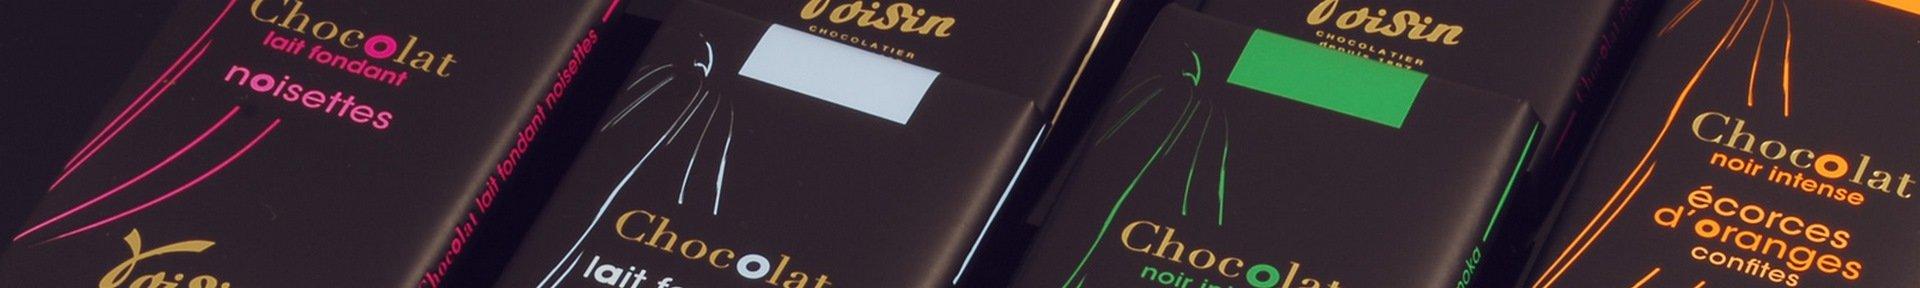 Tablettes de chocolat Voisin